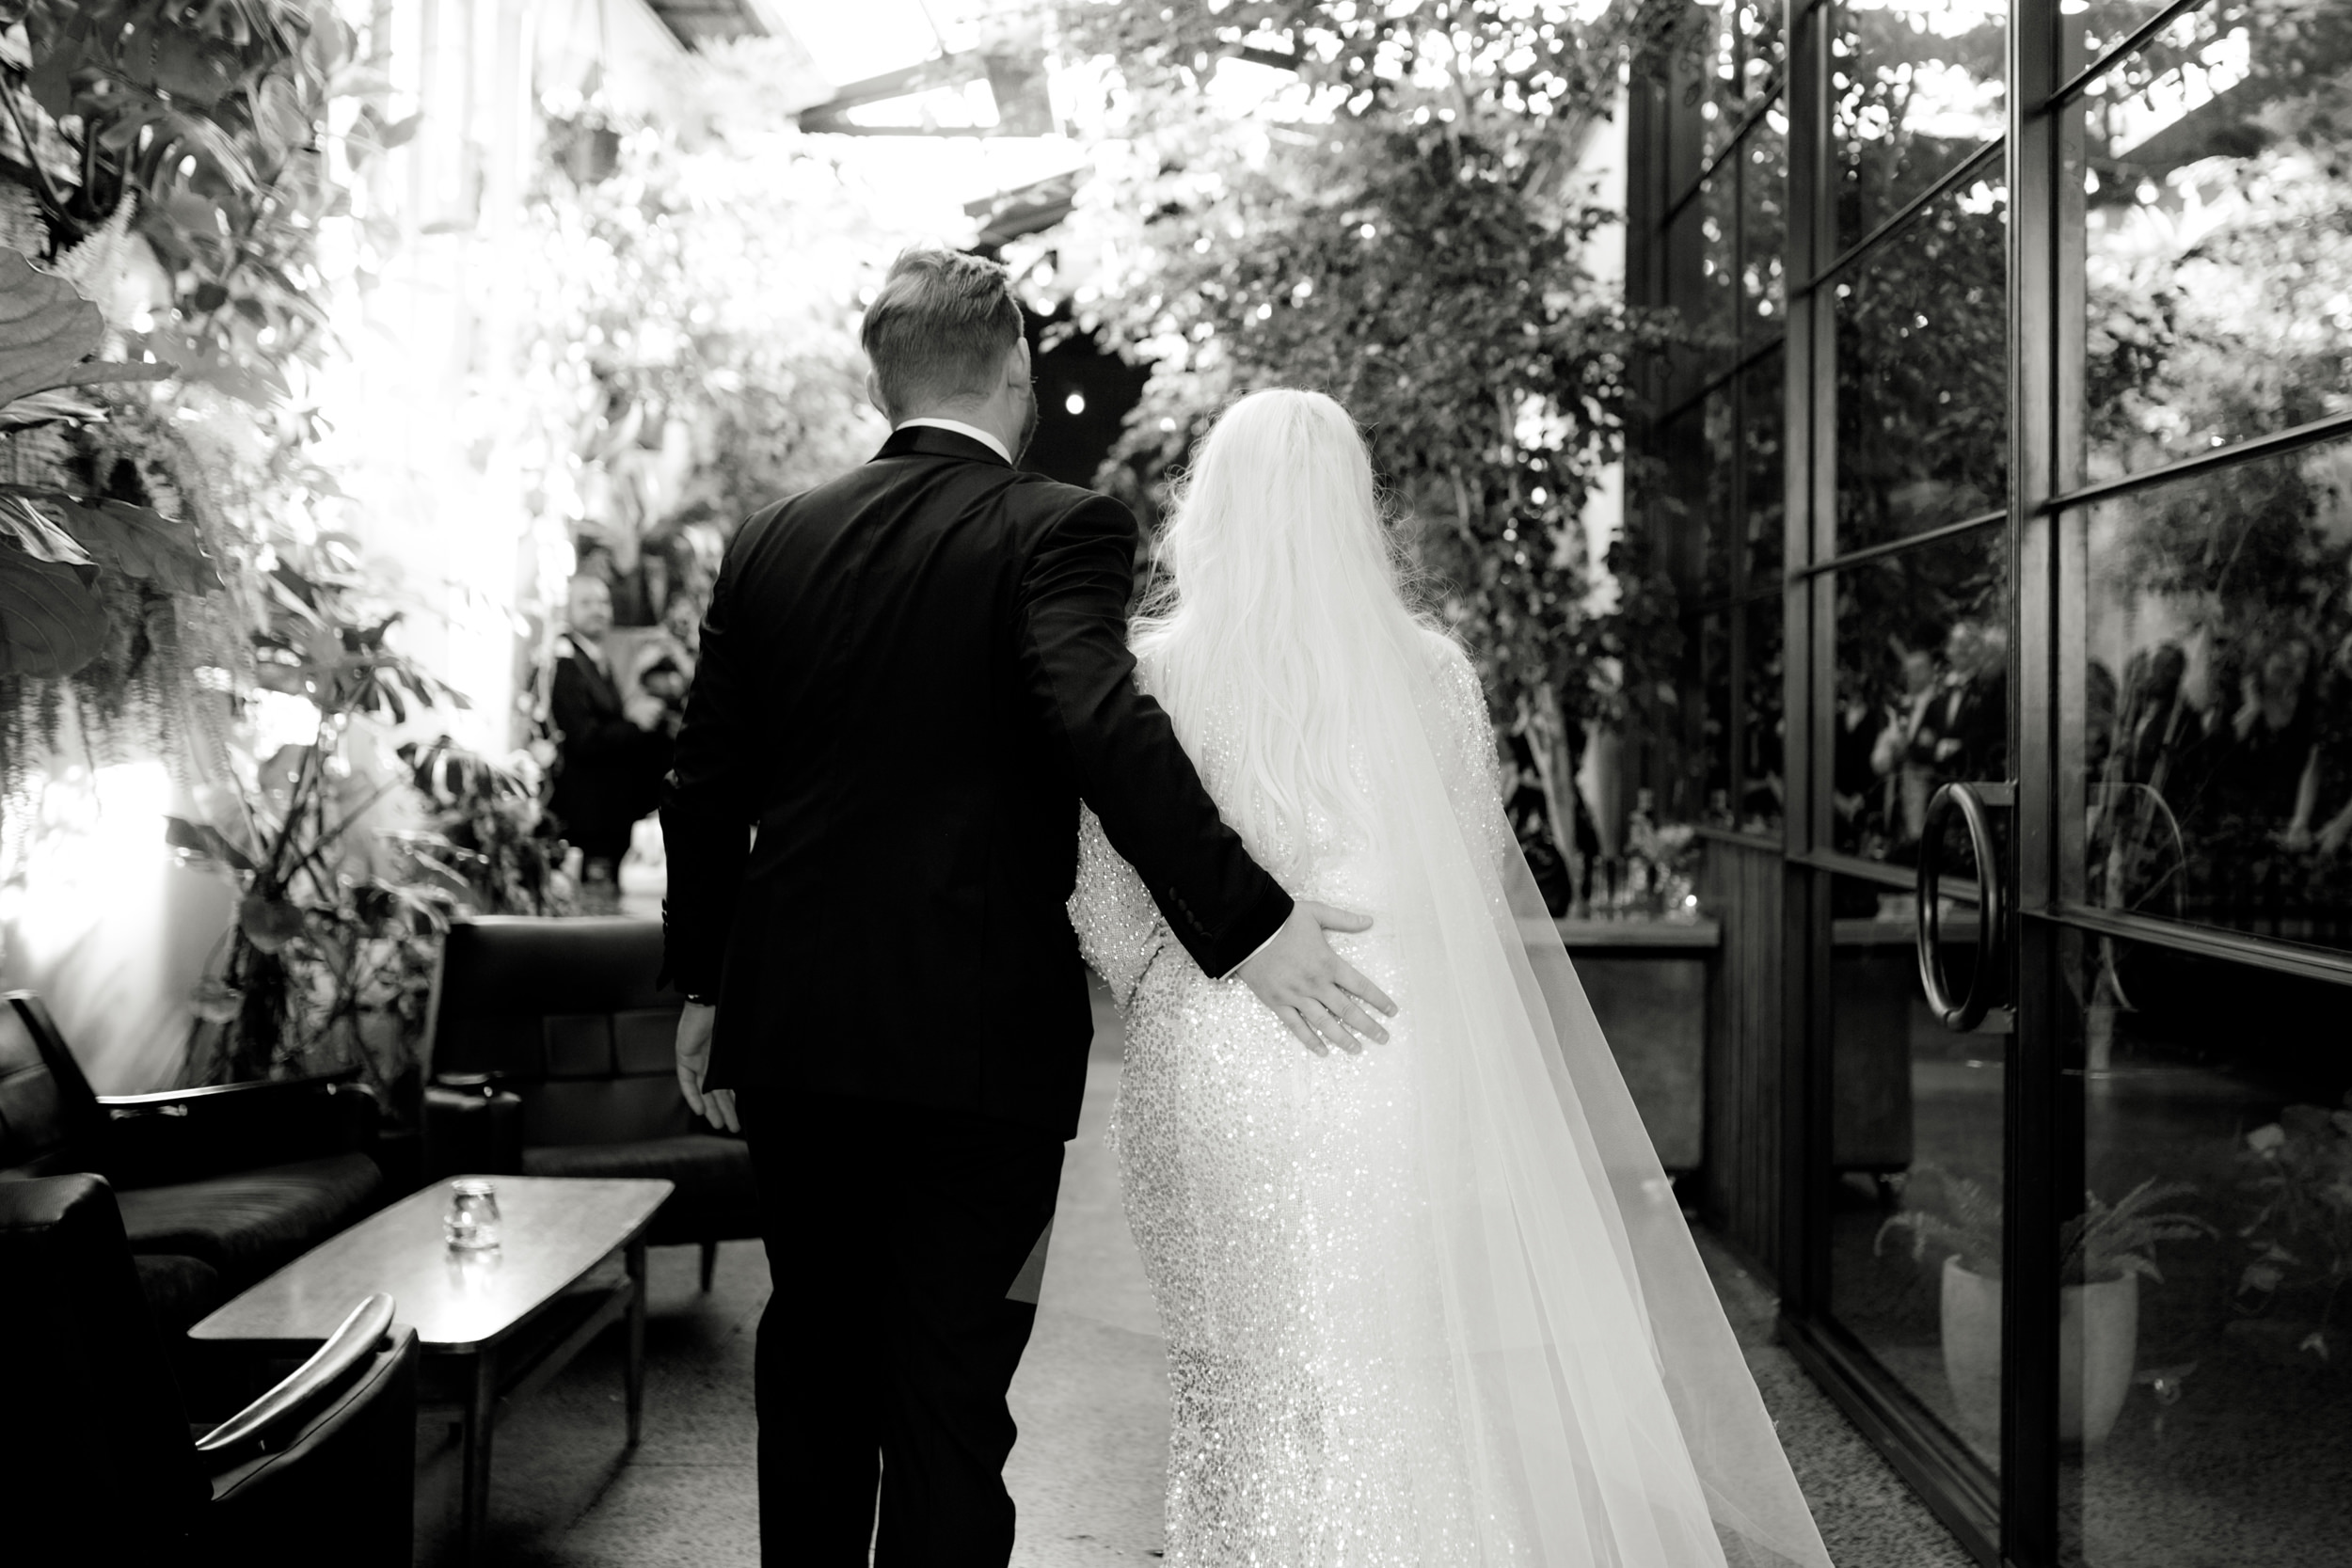 I-Got-You-Babe-Weddings-Tori-Will-Rupert0041.JPG